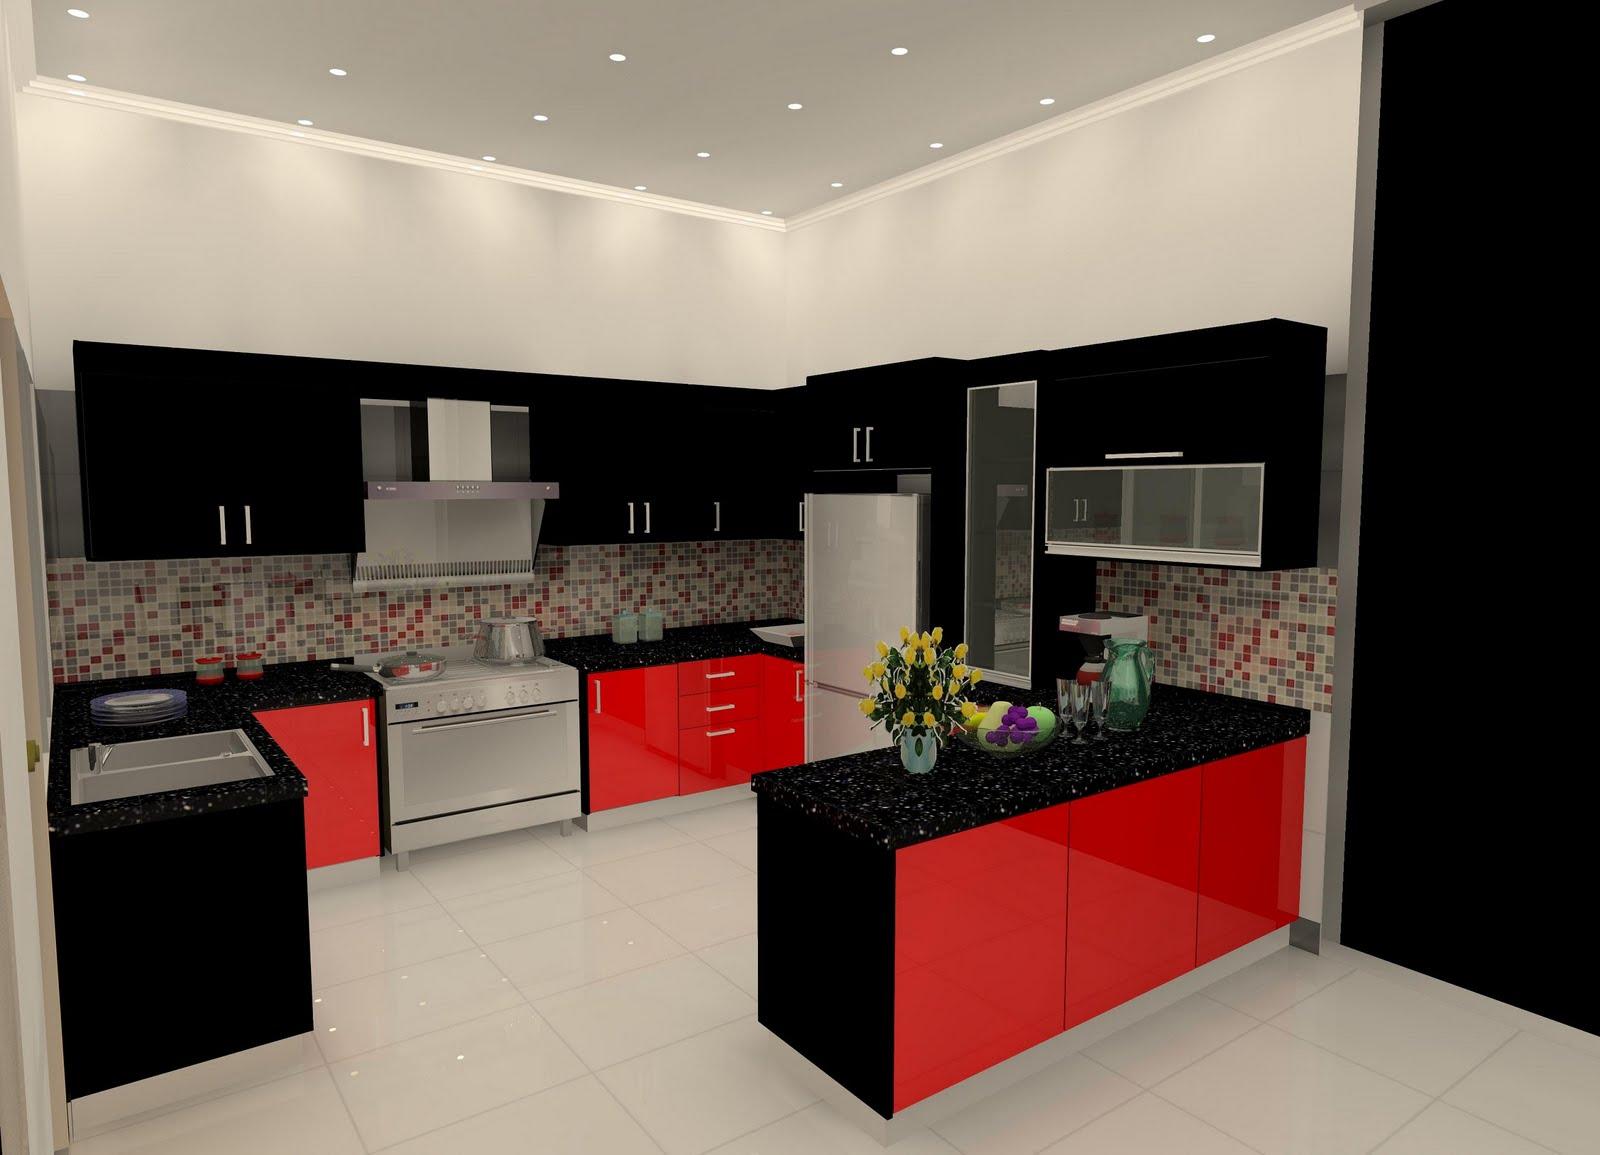 Interior design untuk dapur.cantiknya sebab aku nak buat dapur